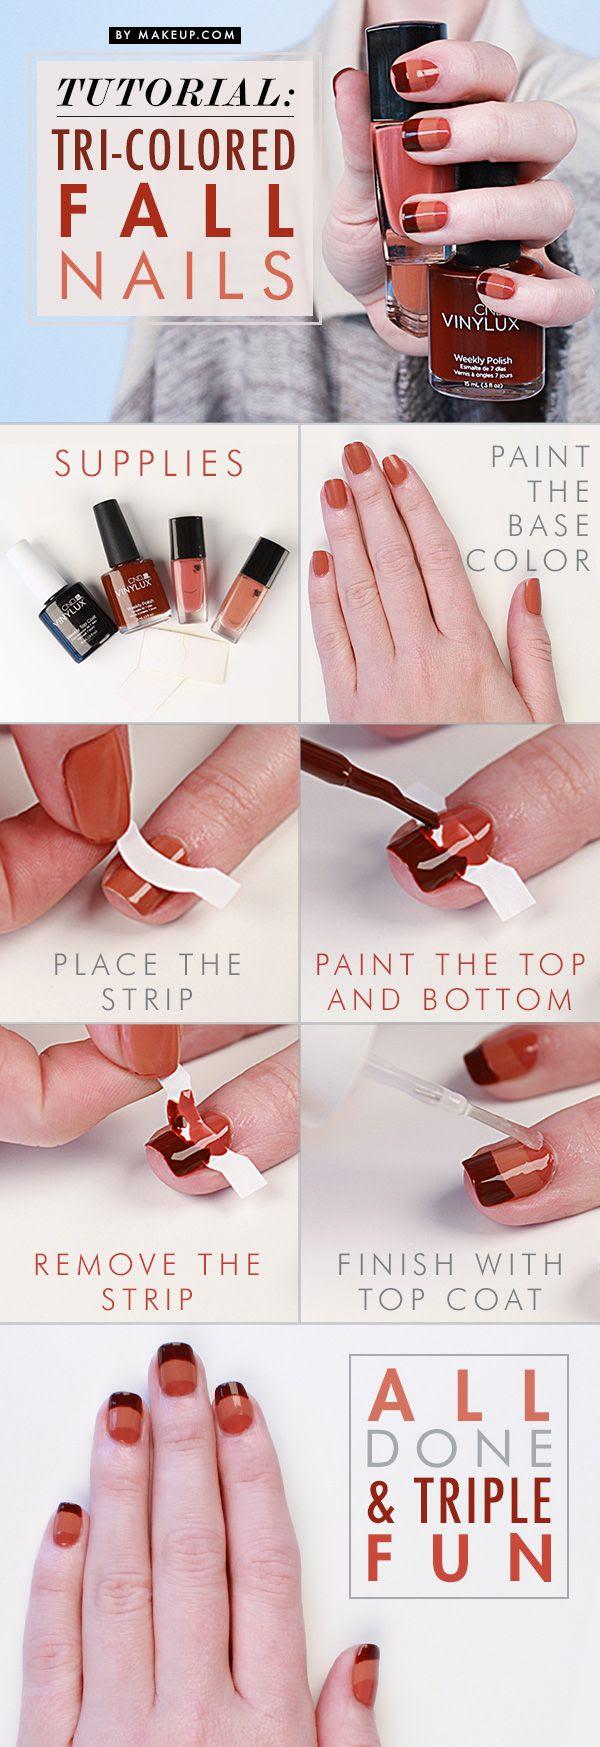 Manicure Tutorial: Tri-Colored Fall Nail Art